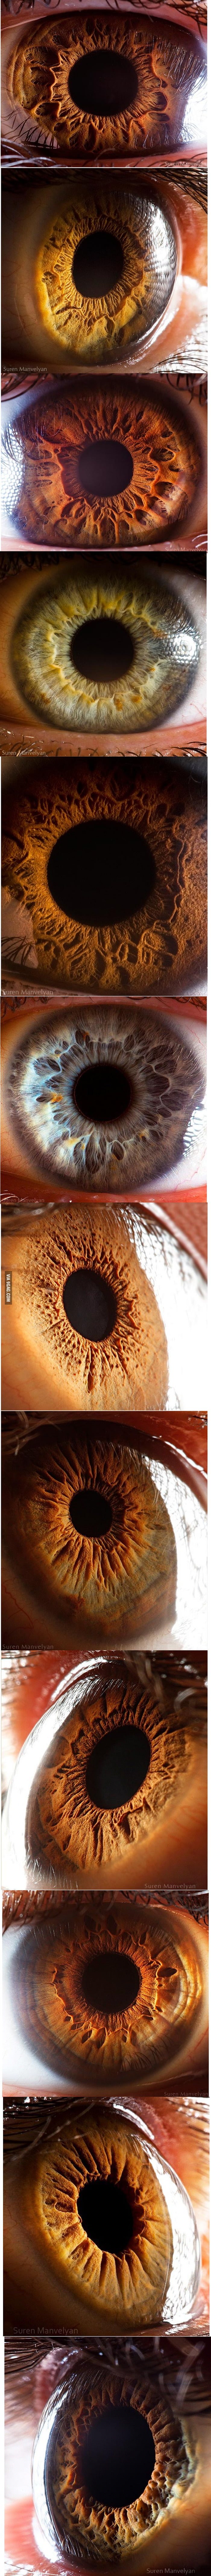 Mezmerising close-up photos of the human eye